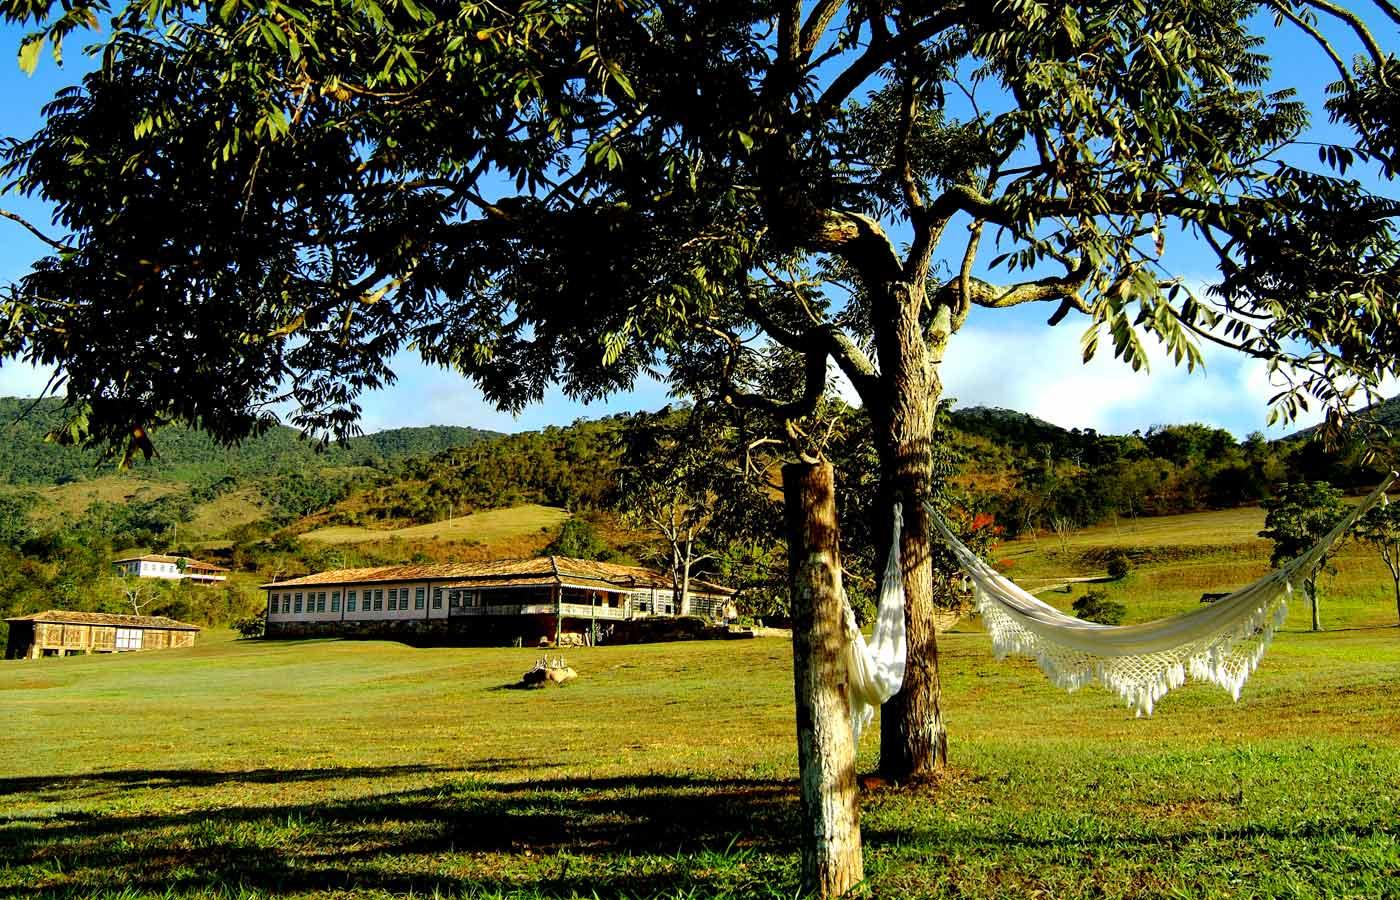 Reserva do Ibitipoca - luxury countryside retreat, Brazil